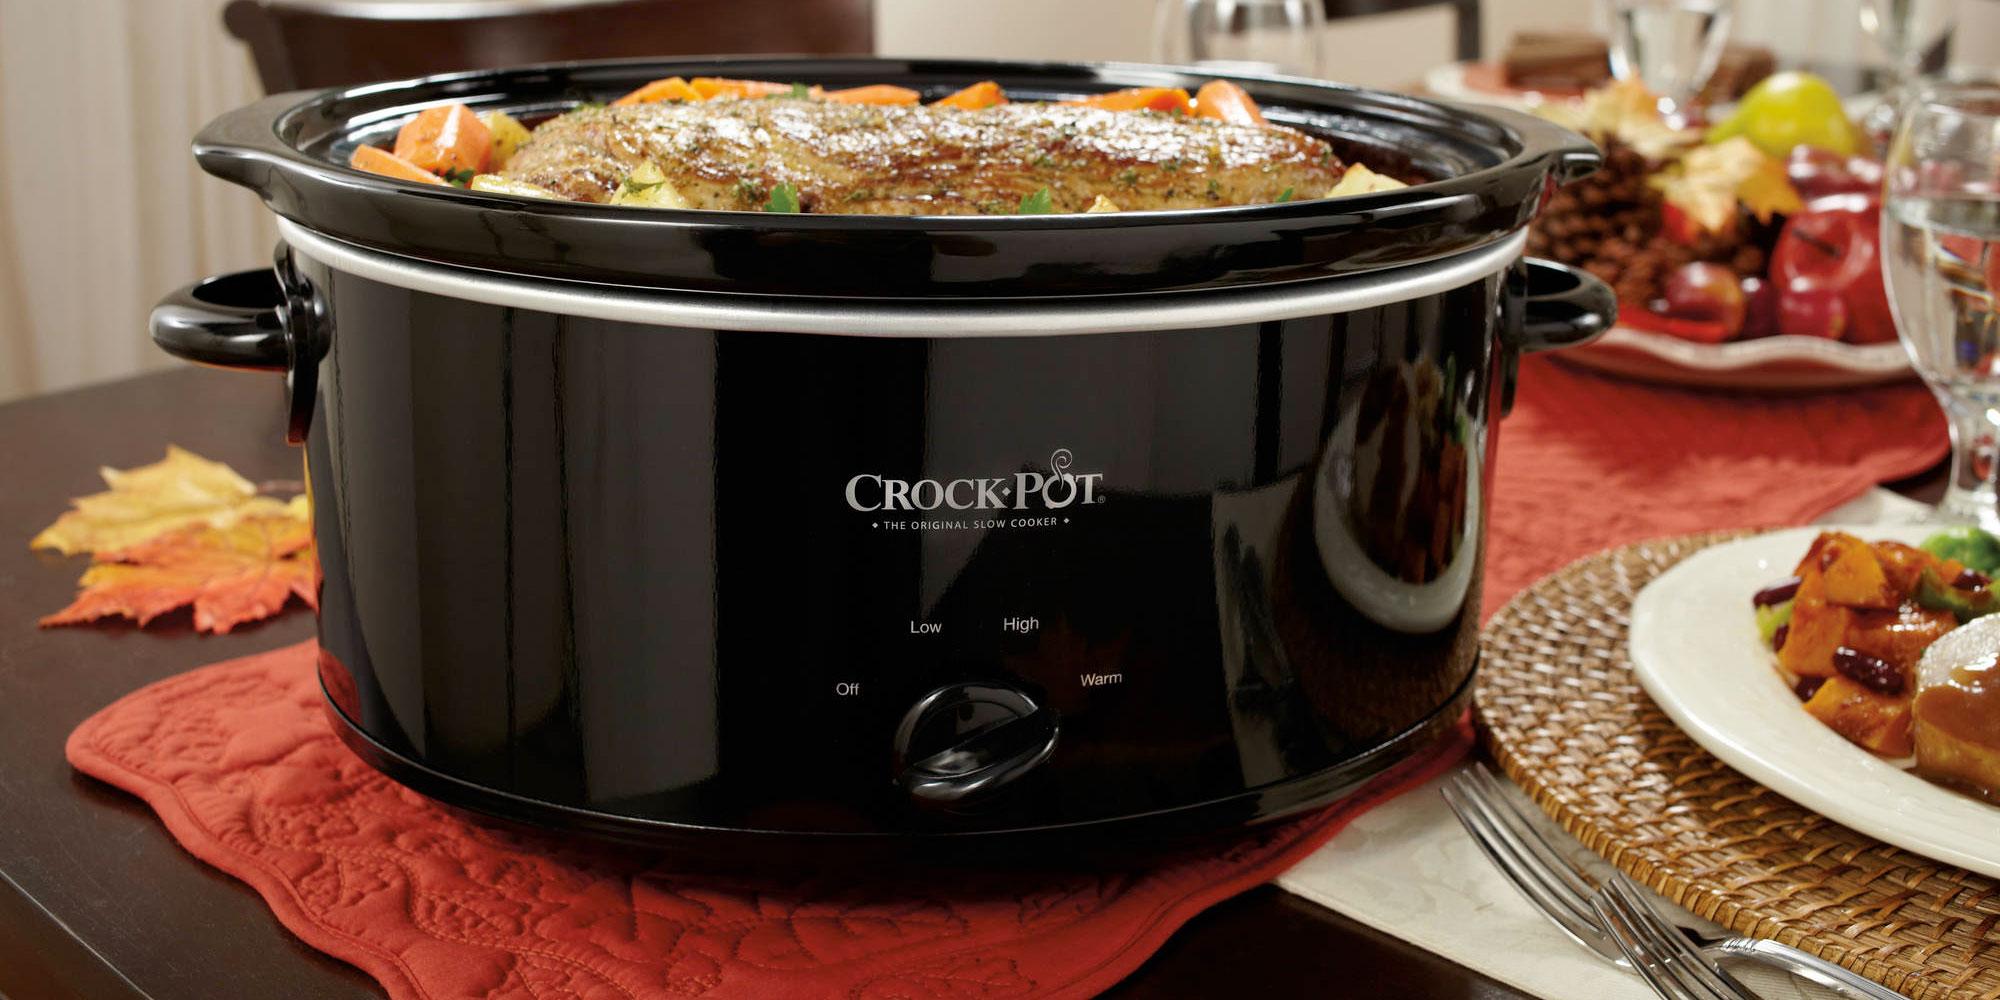 Enjoy Roast & Carrots With 7-qt. Crock-pot Slow Cooker 20 Reg. 30 - 9to5toys